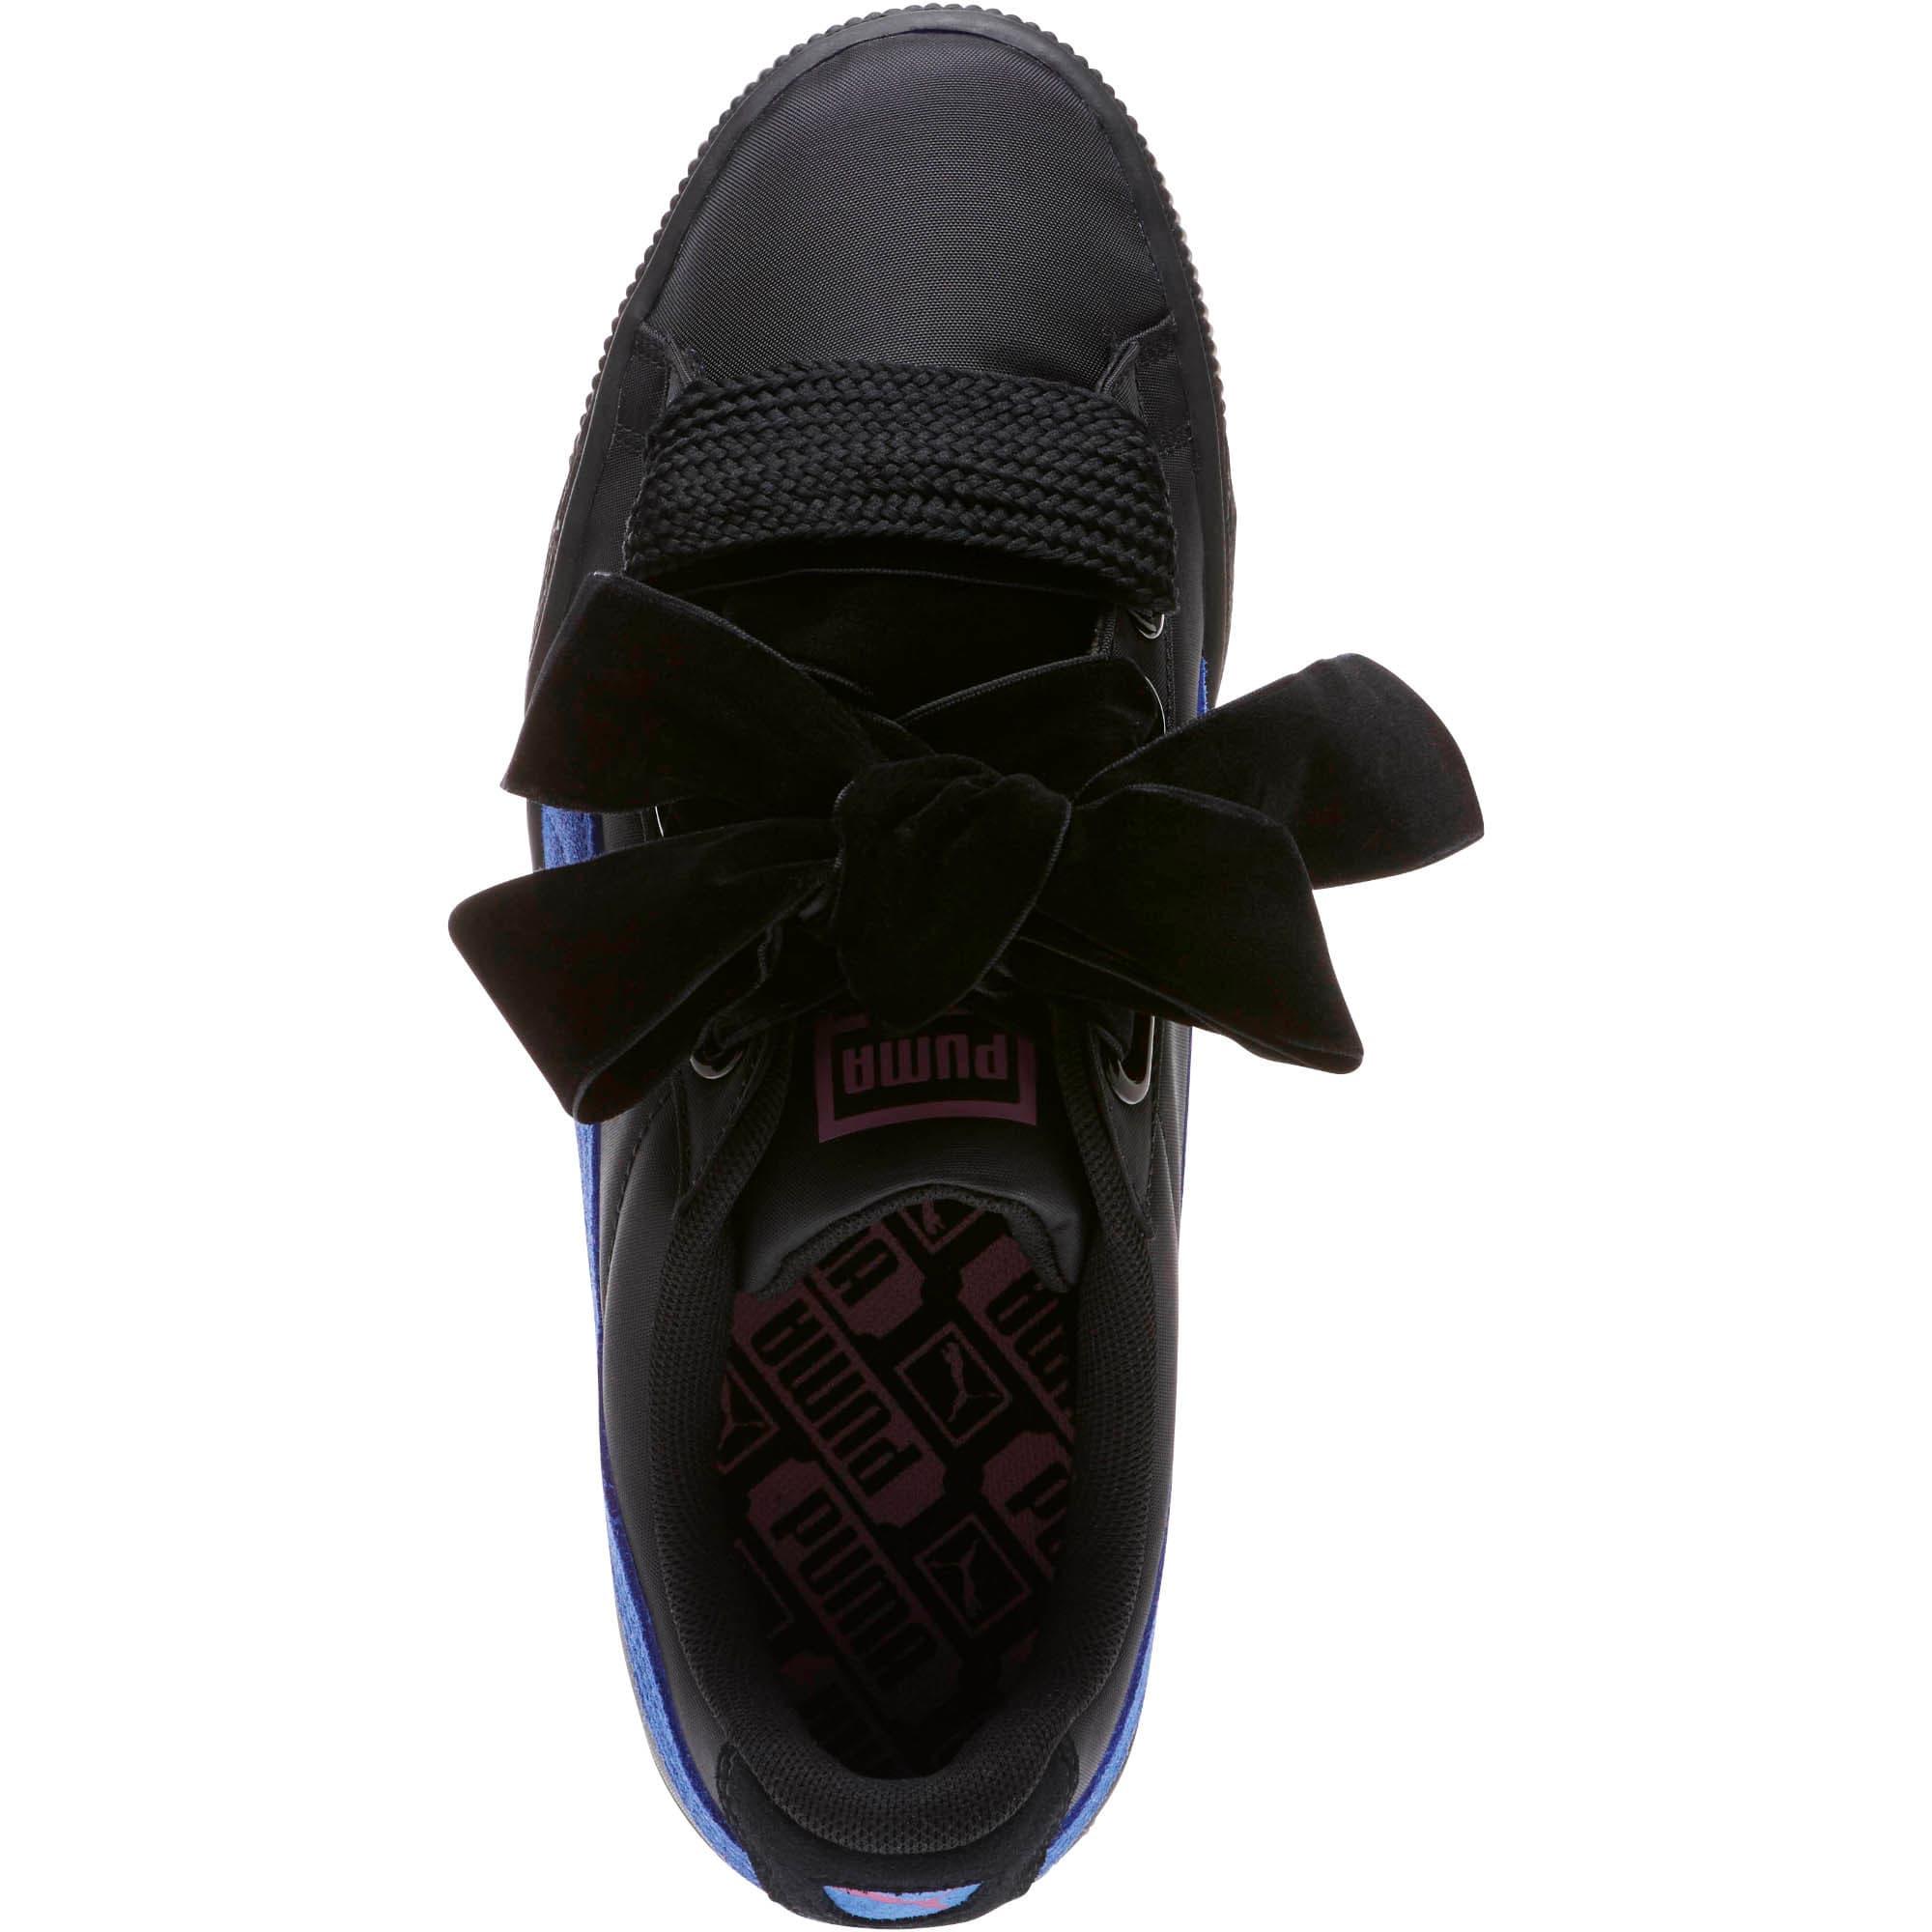 Thumbnail 5 of Basket Heart Nylon Women's Sneakers, Puma Black-Baja Blue, medium